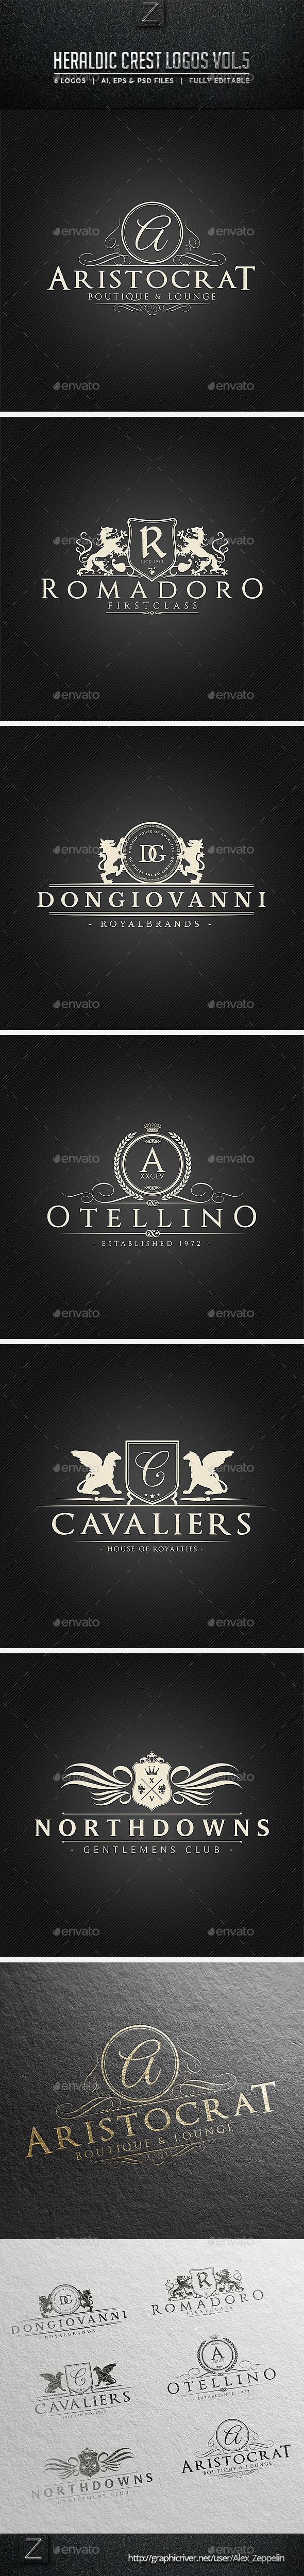 Heraldic Crest Logos Vol.5 - Badges & Stickers Web Elements